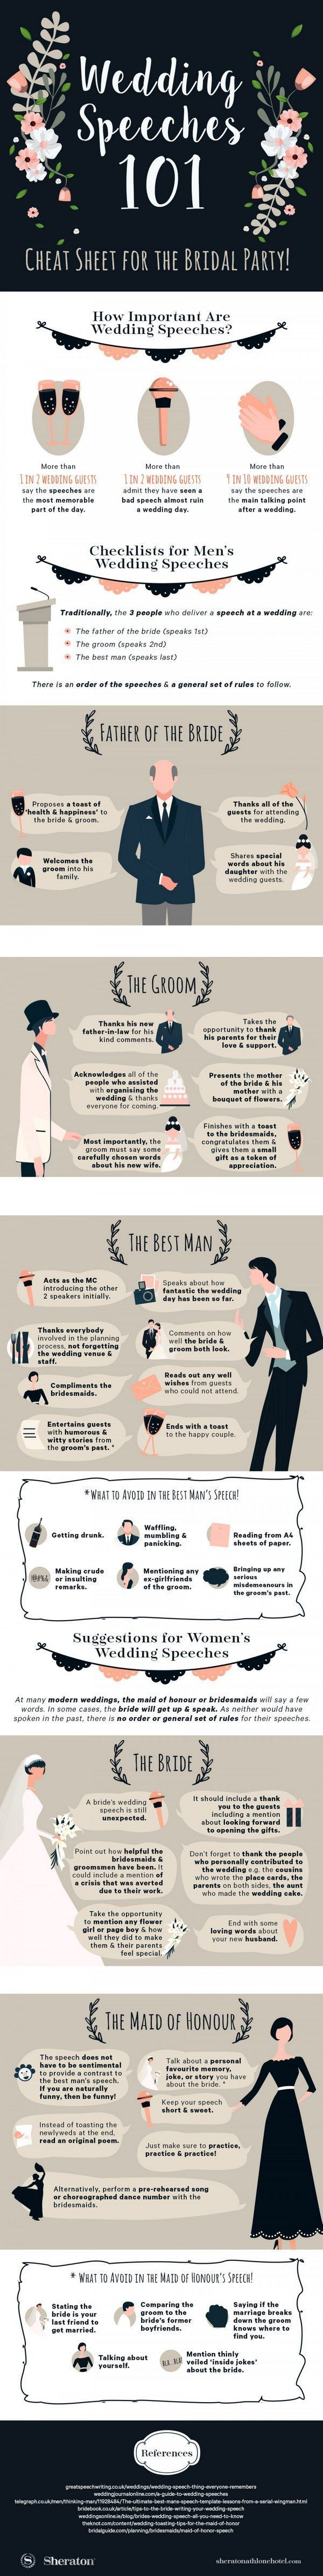 wedding speeches 101 infographic / http://www.deerpearlflowers.com/wedding-planning-infographics/5/ #weddinginfographic